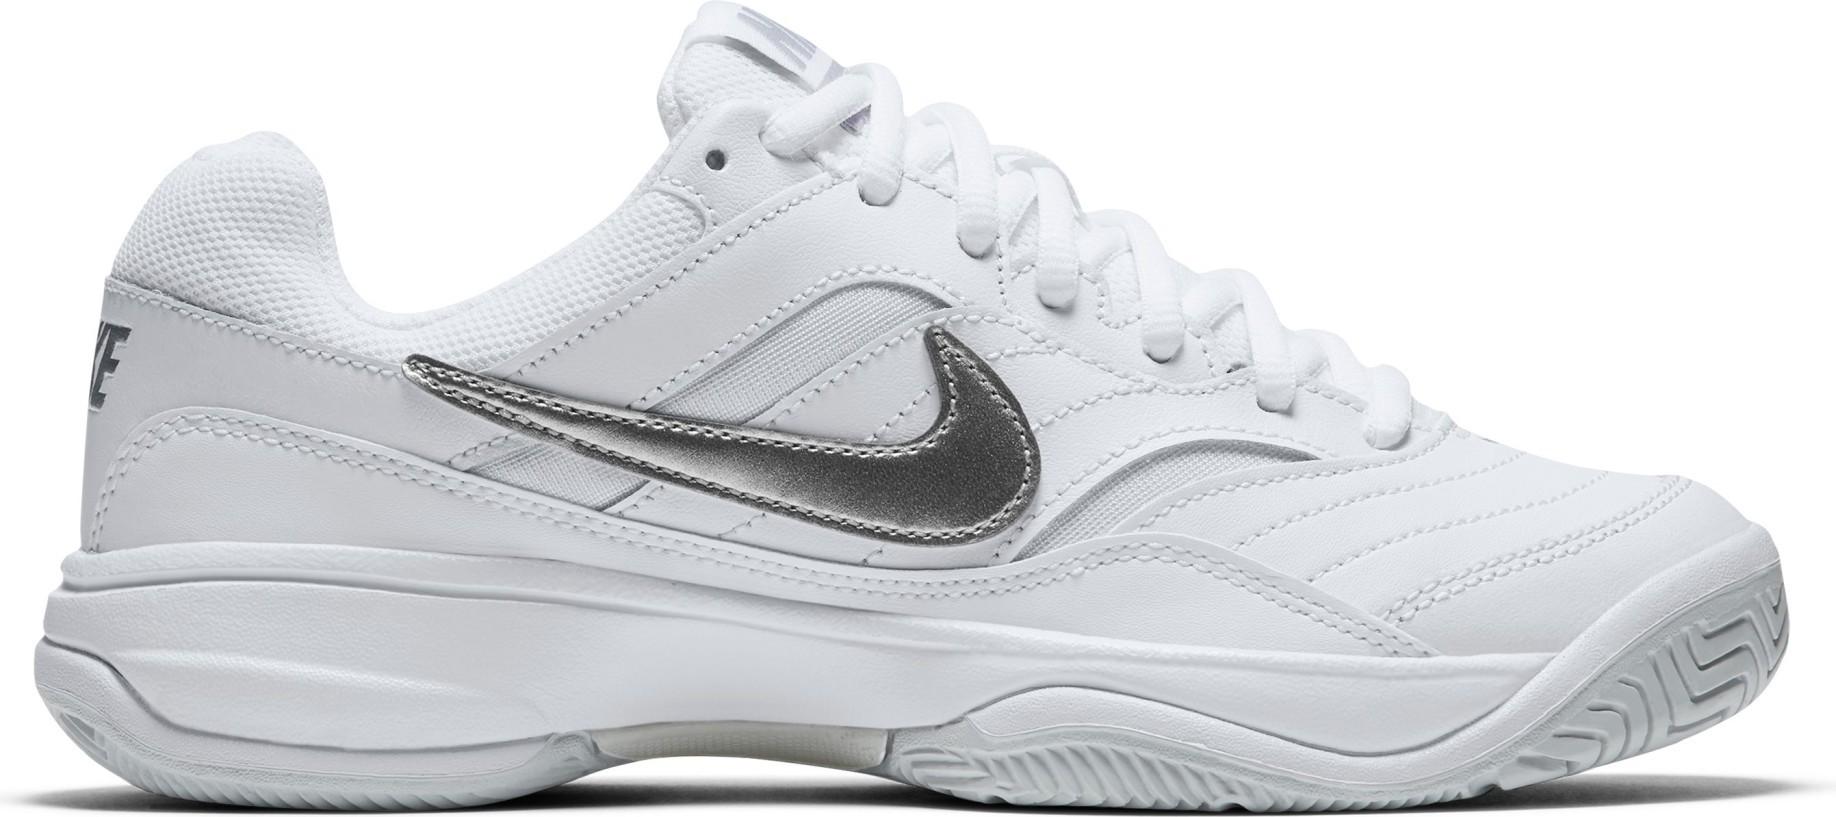 brand new f2d0e c61db Shoes Womens Court Lite colore White Grey - Nike - SportIT.c